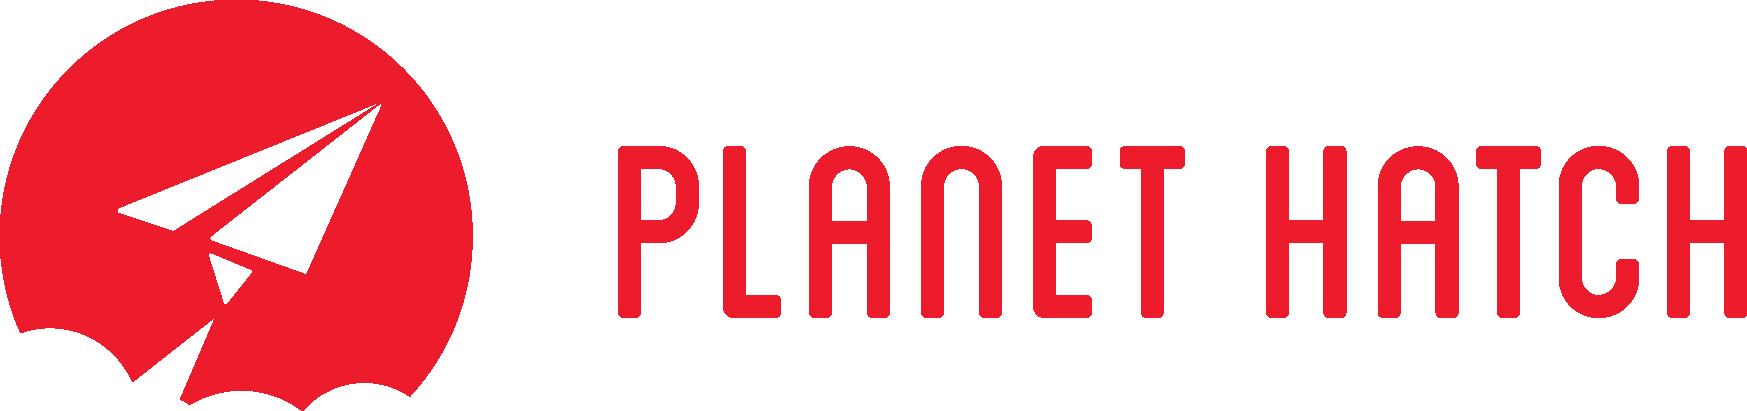 Planet Hatch Logo